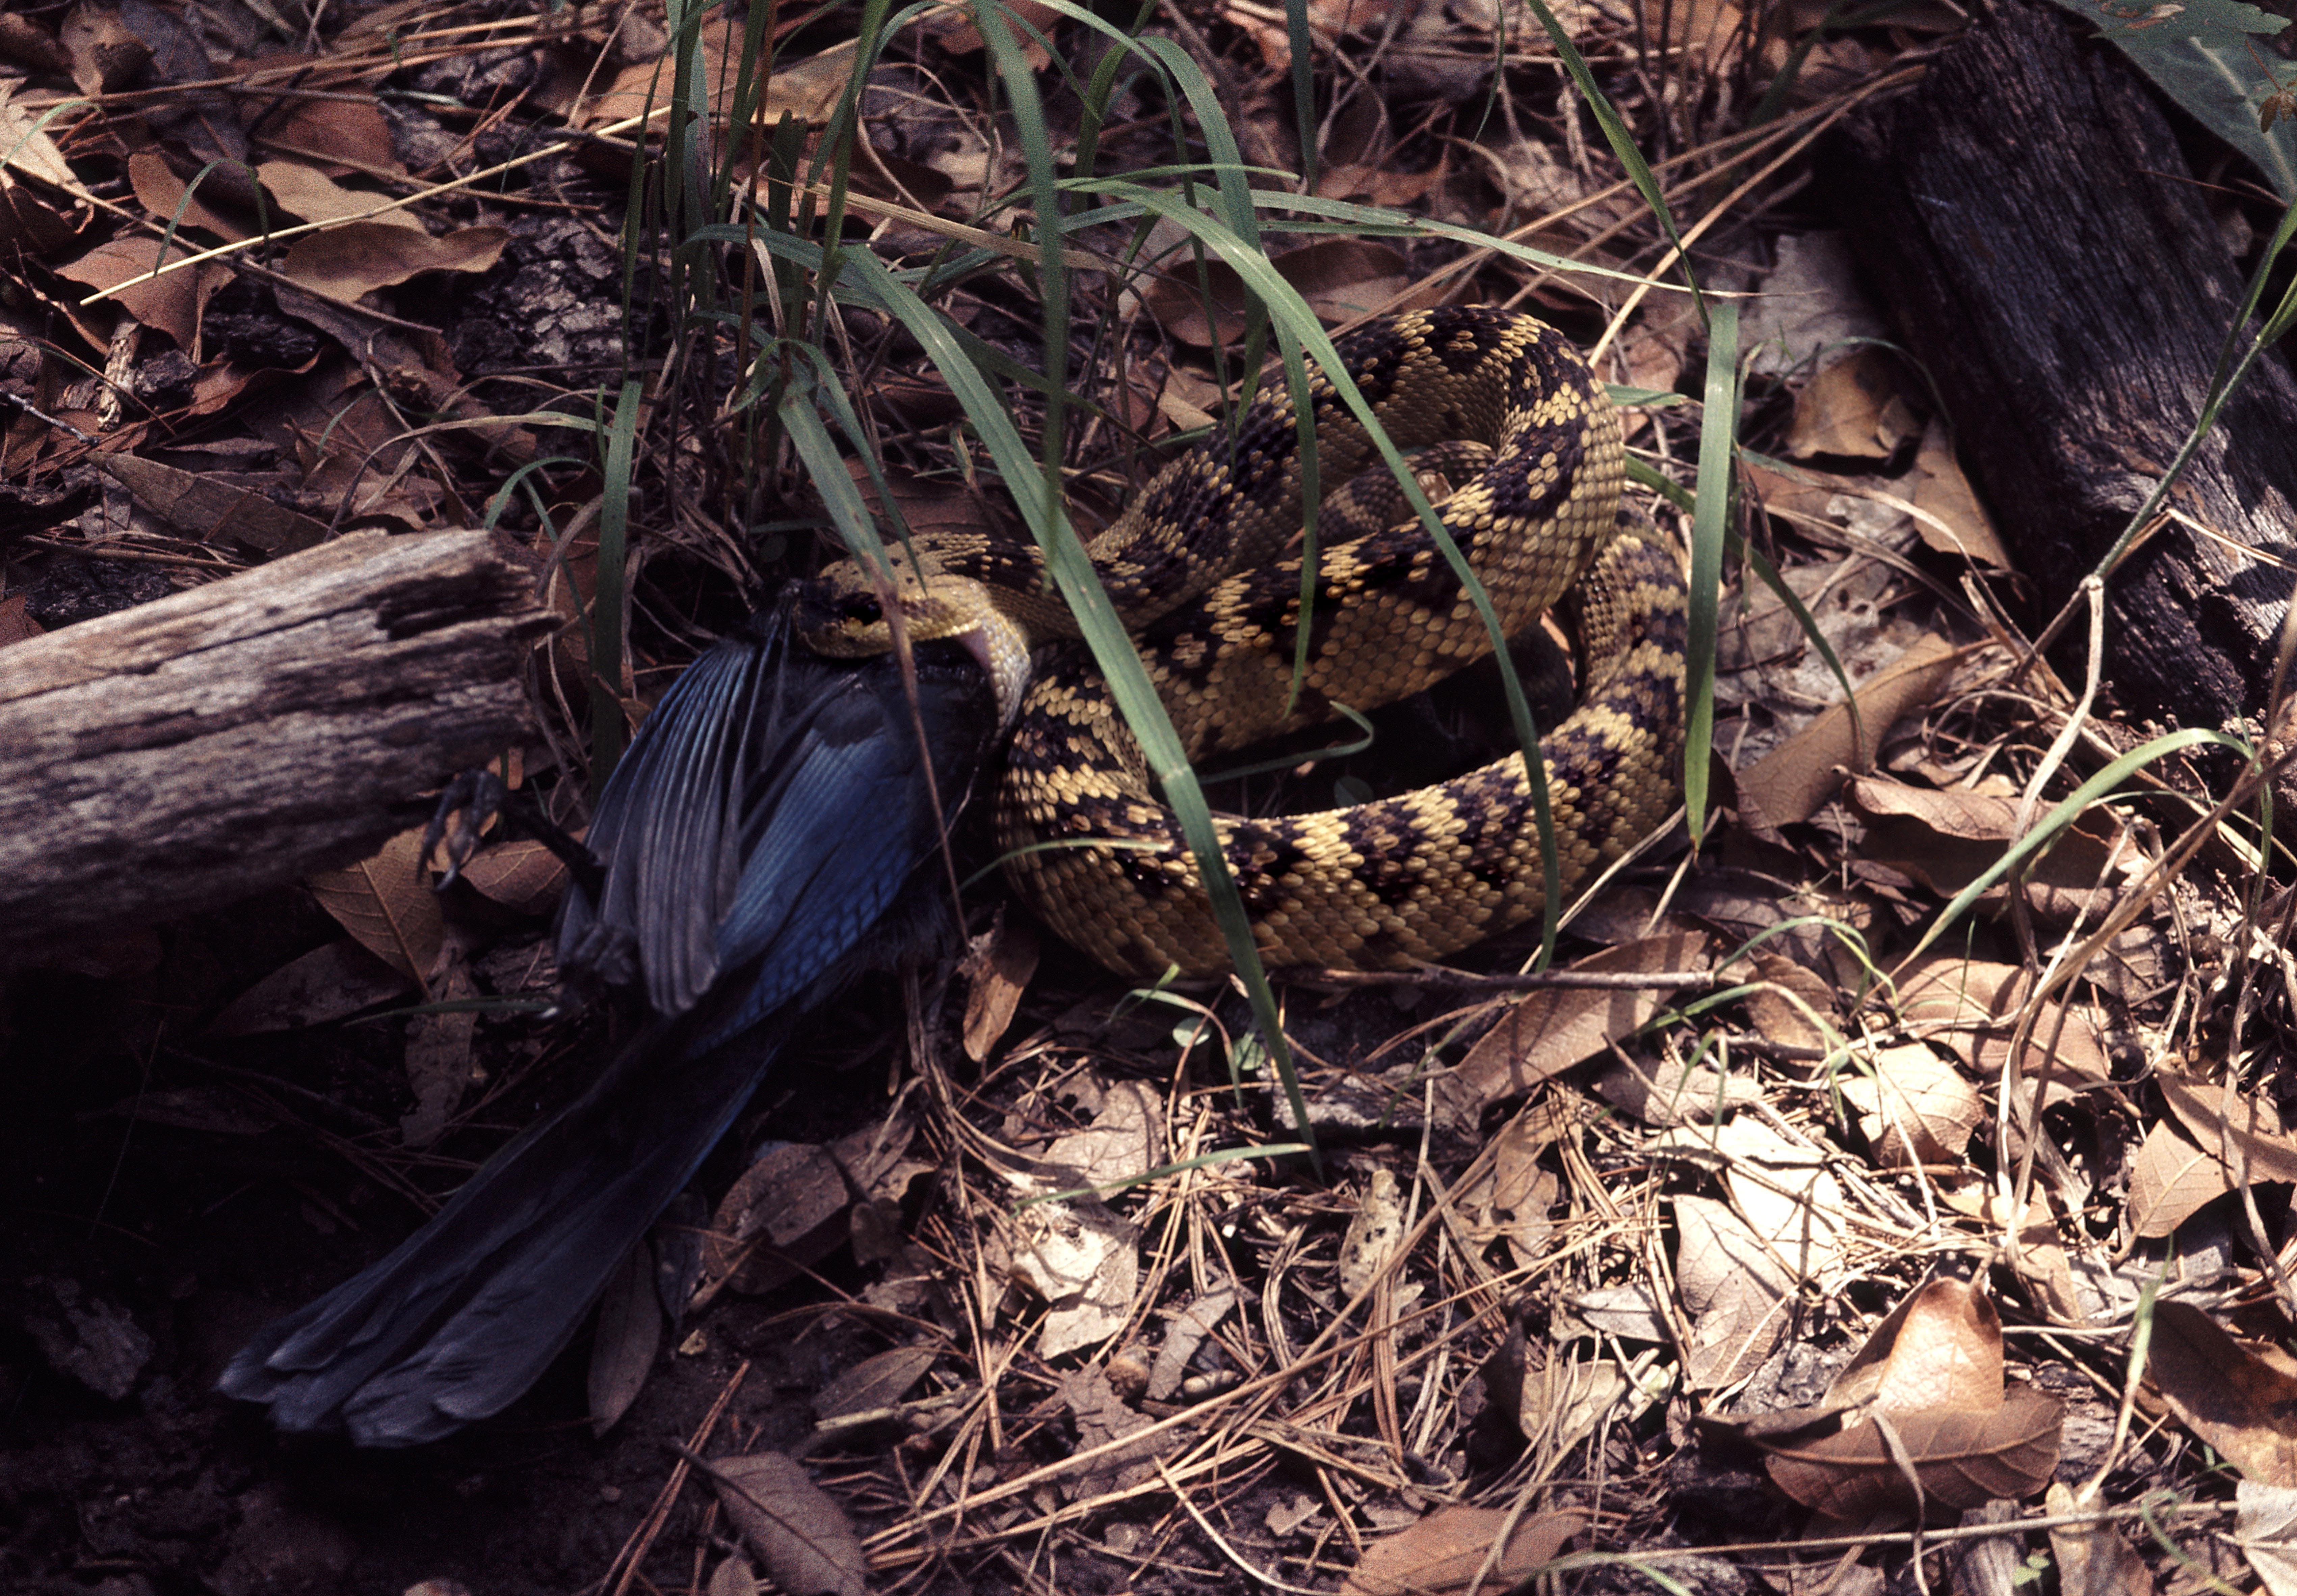 Brown and Black Python on Ground